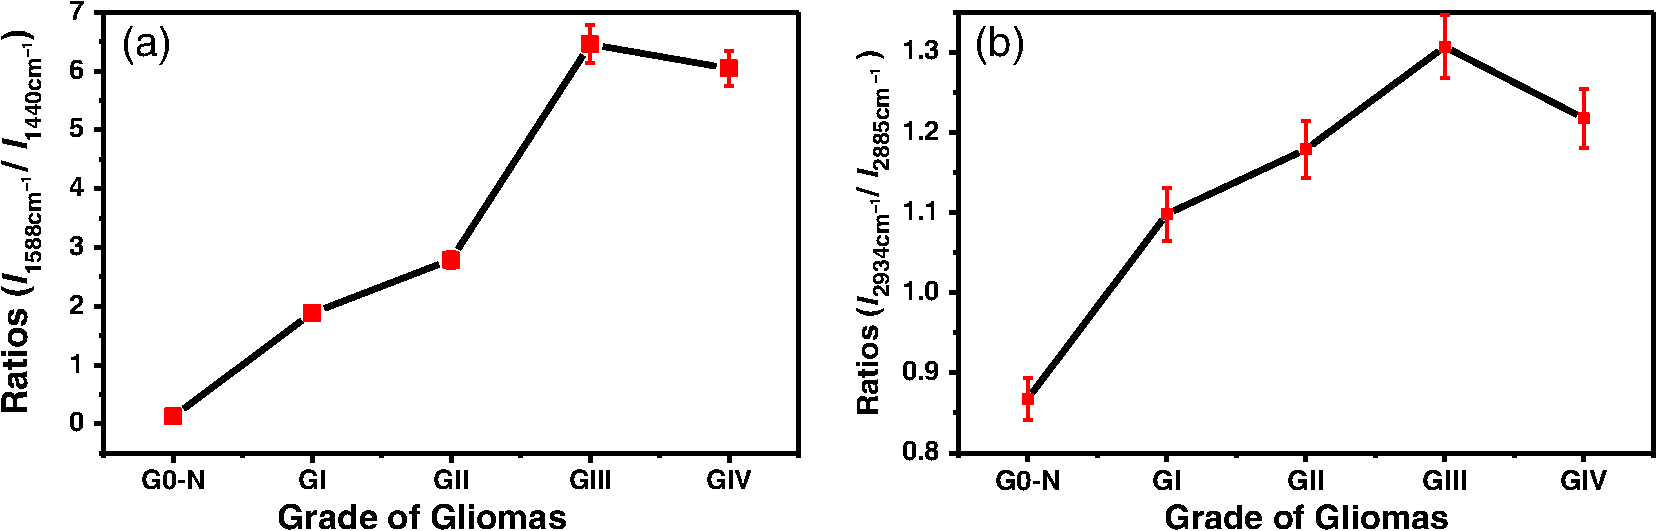 Visible resonance Raman spectroscopy for identifying and grading gliomas, Robert Alfano, et al., City University of New York.